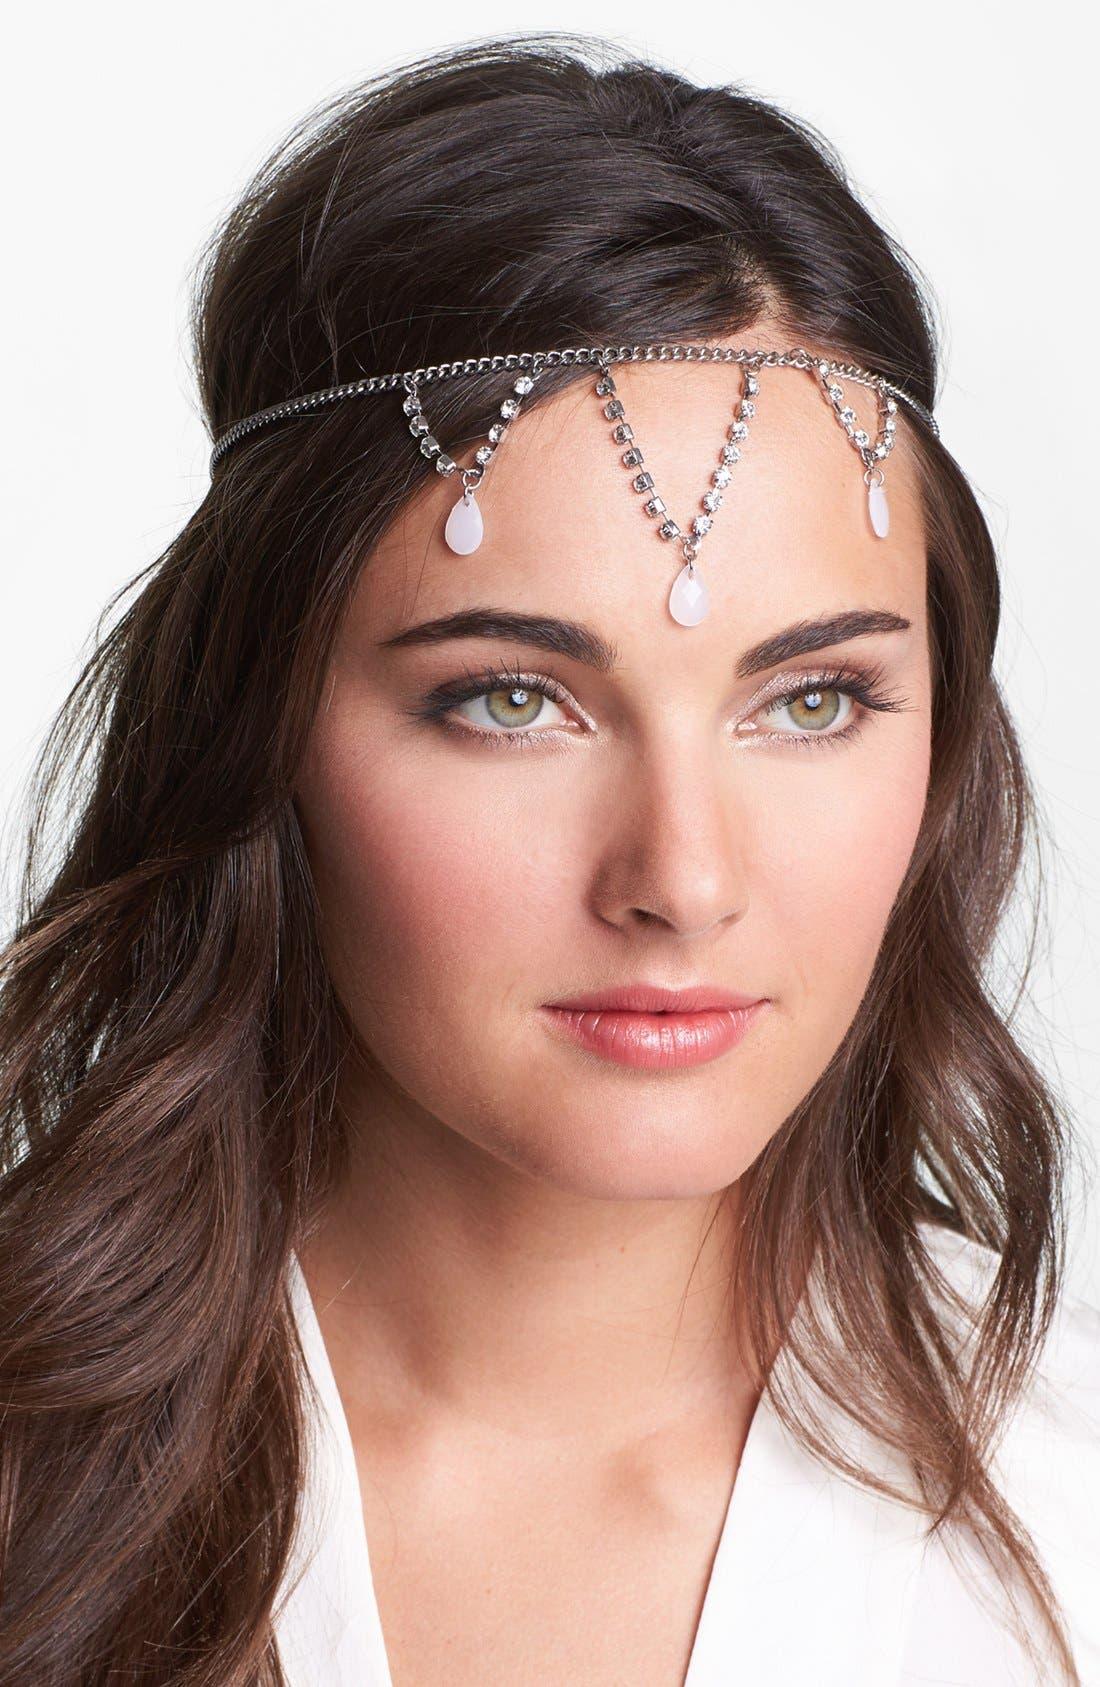 Main Image - Berry 'Goddess' Head Wrap